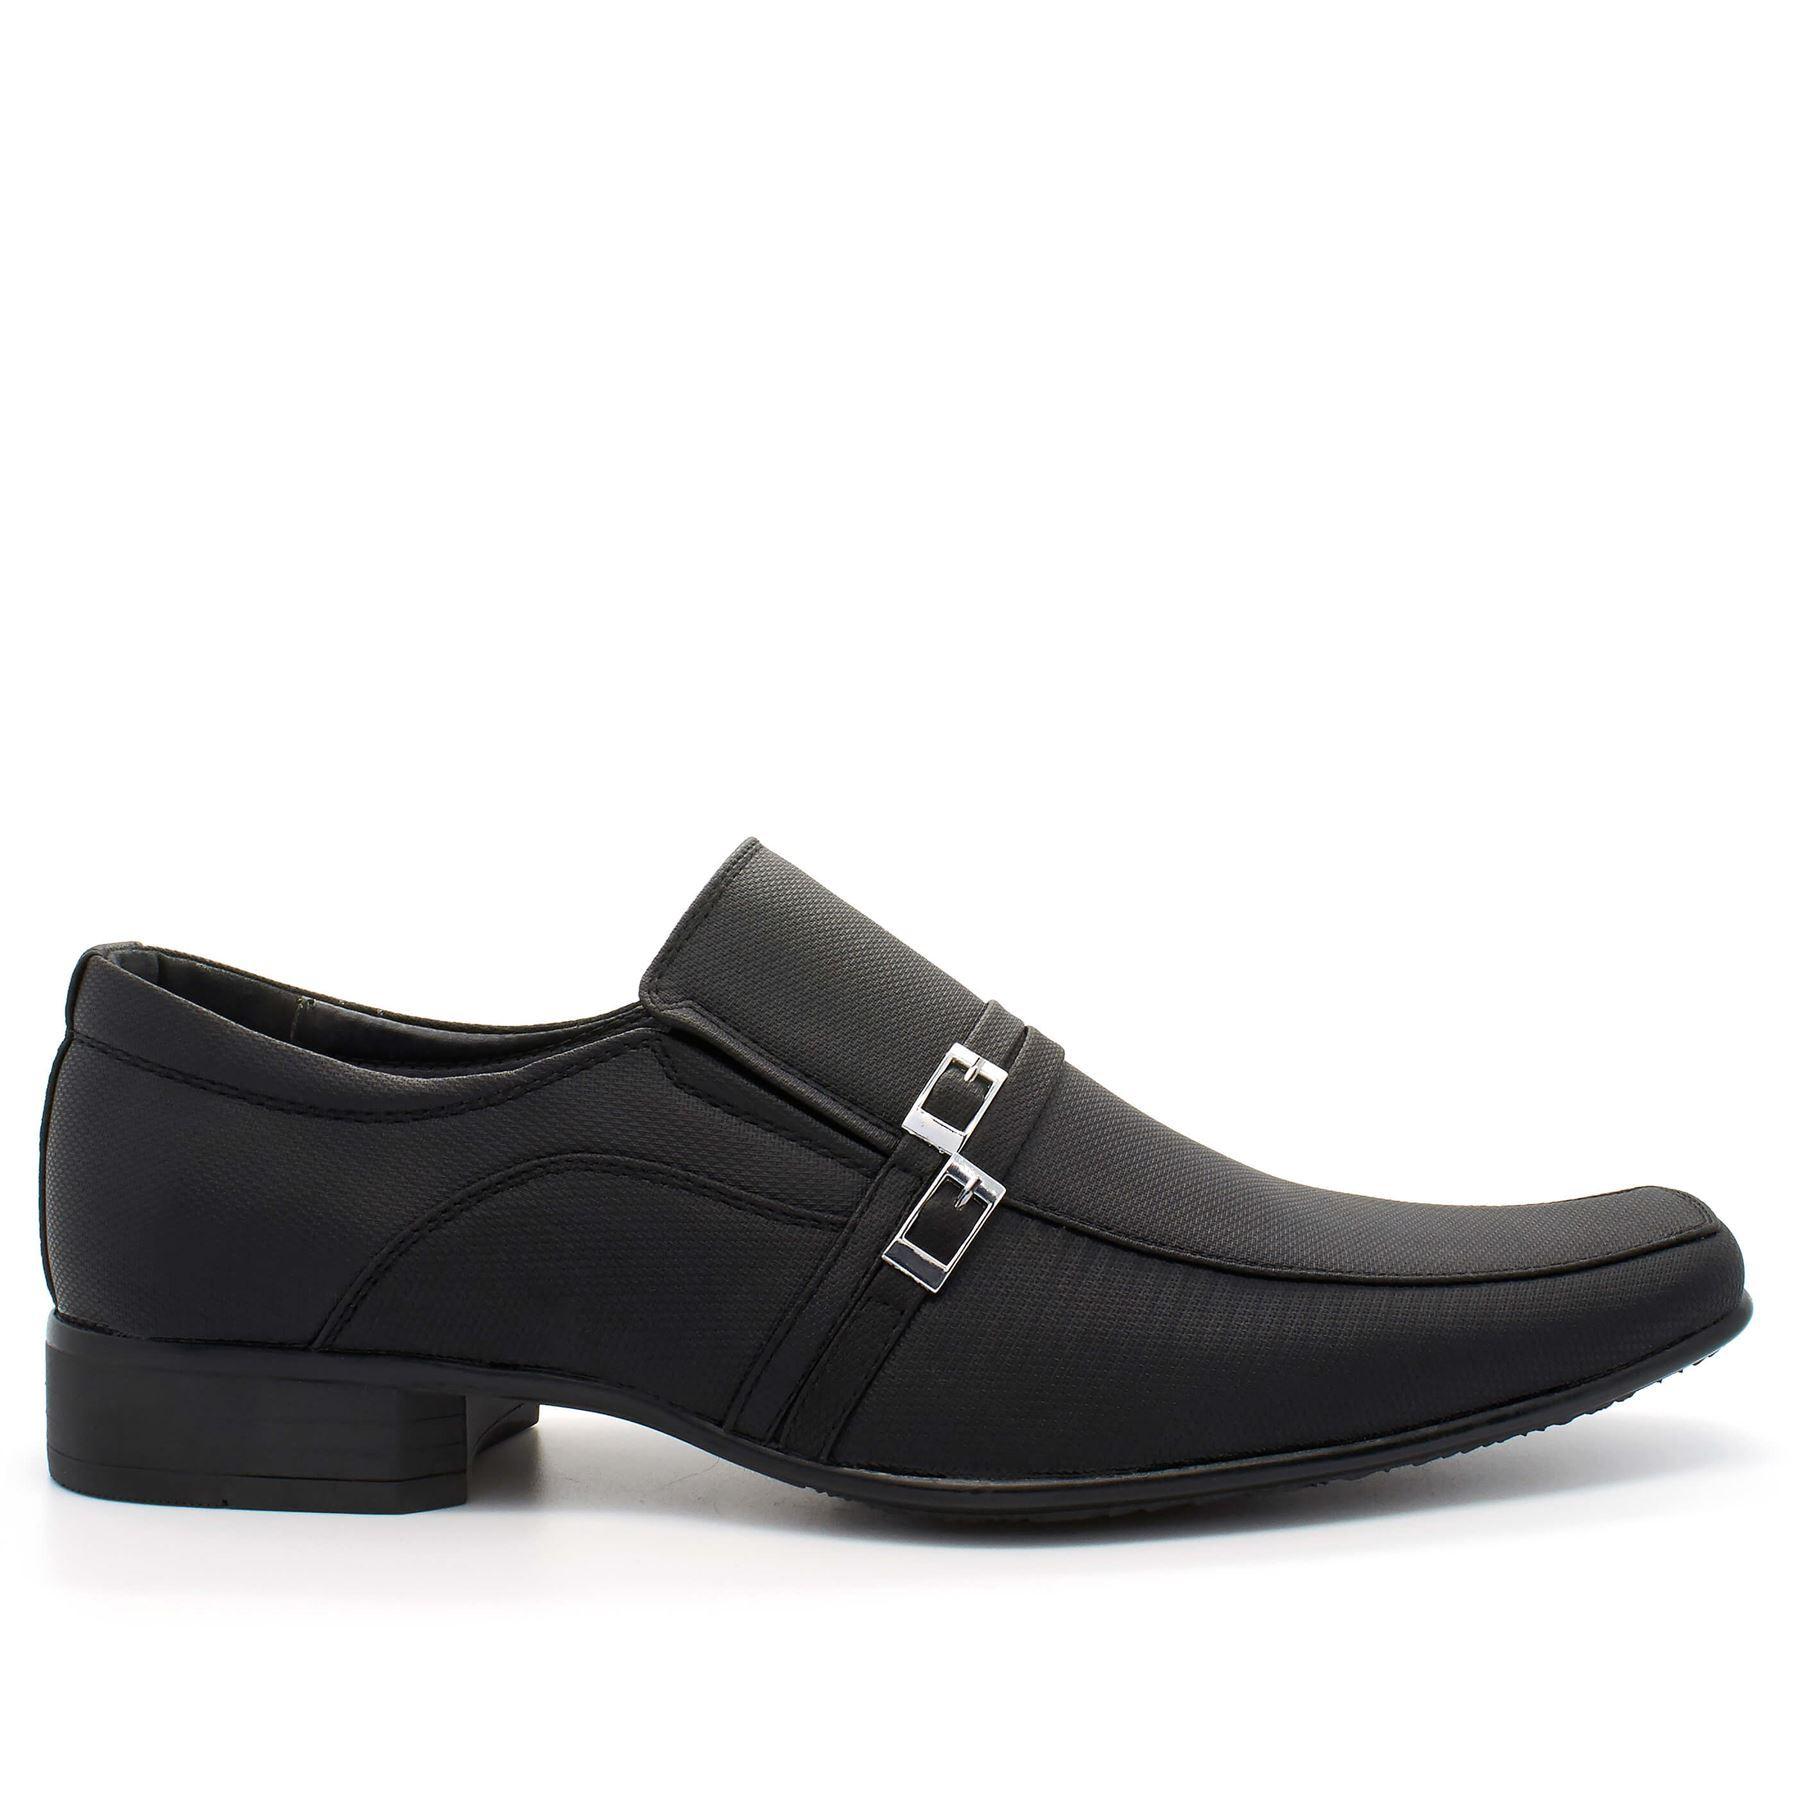 mens new wedding smart dress slip on black formal shoes uk